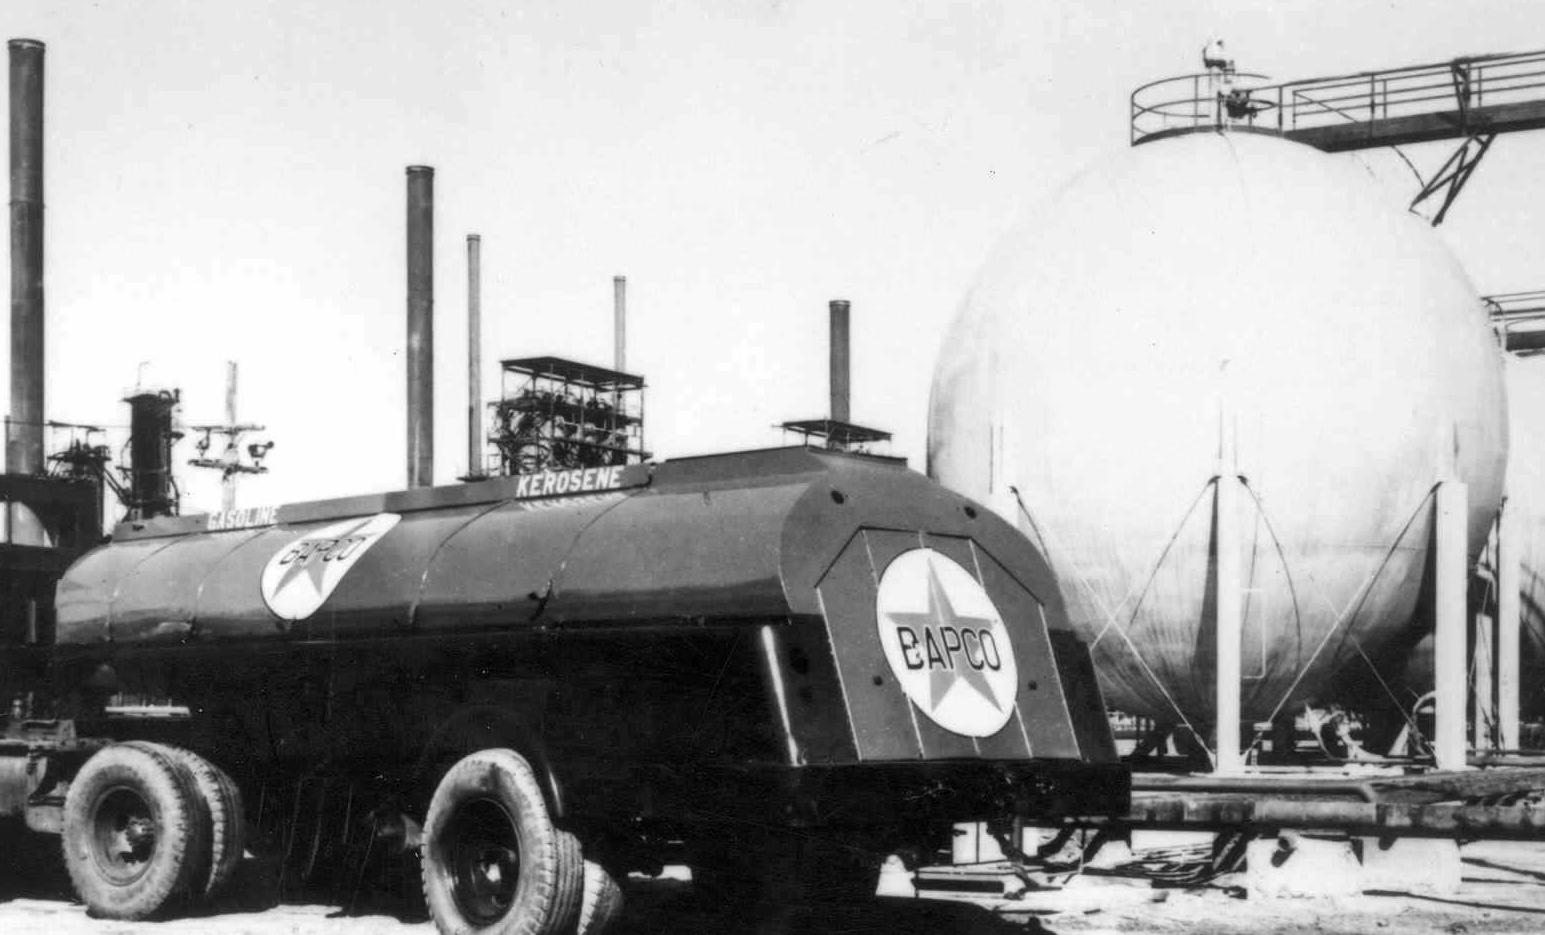 1946 (January) Bapco tank truck alongside Horton spheres.jpg